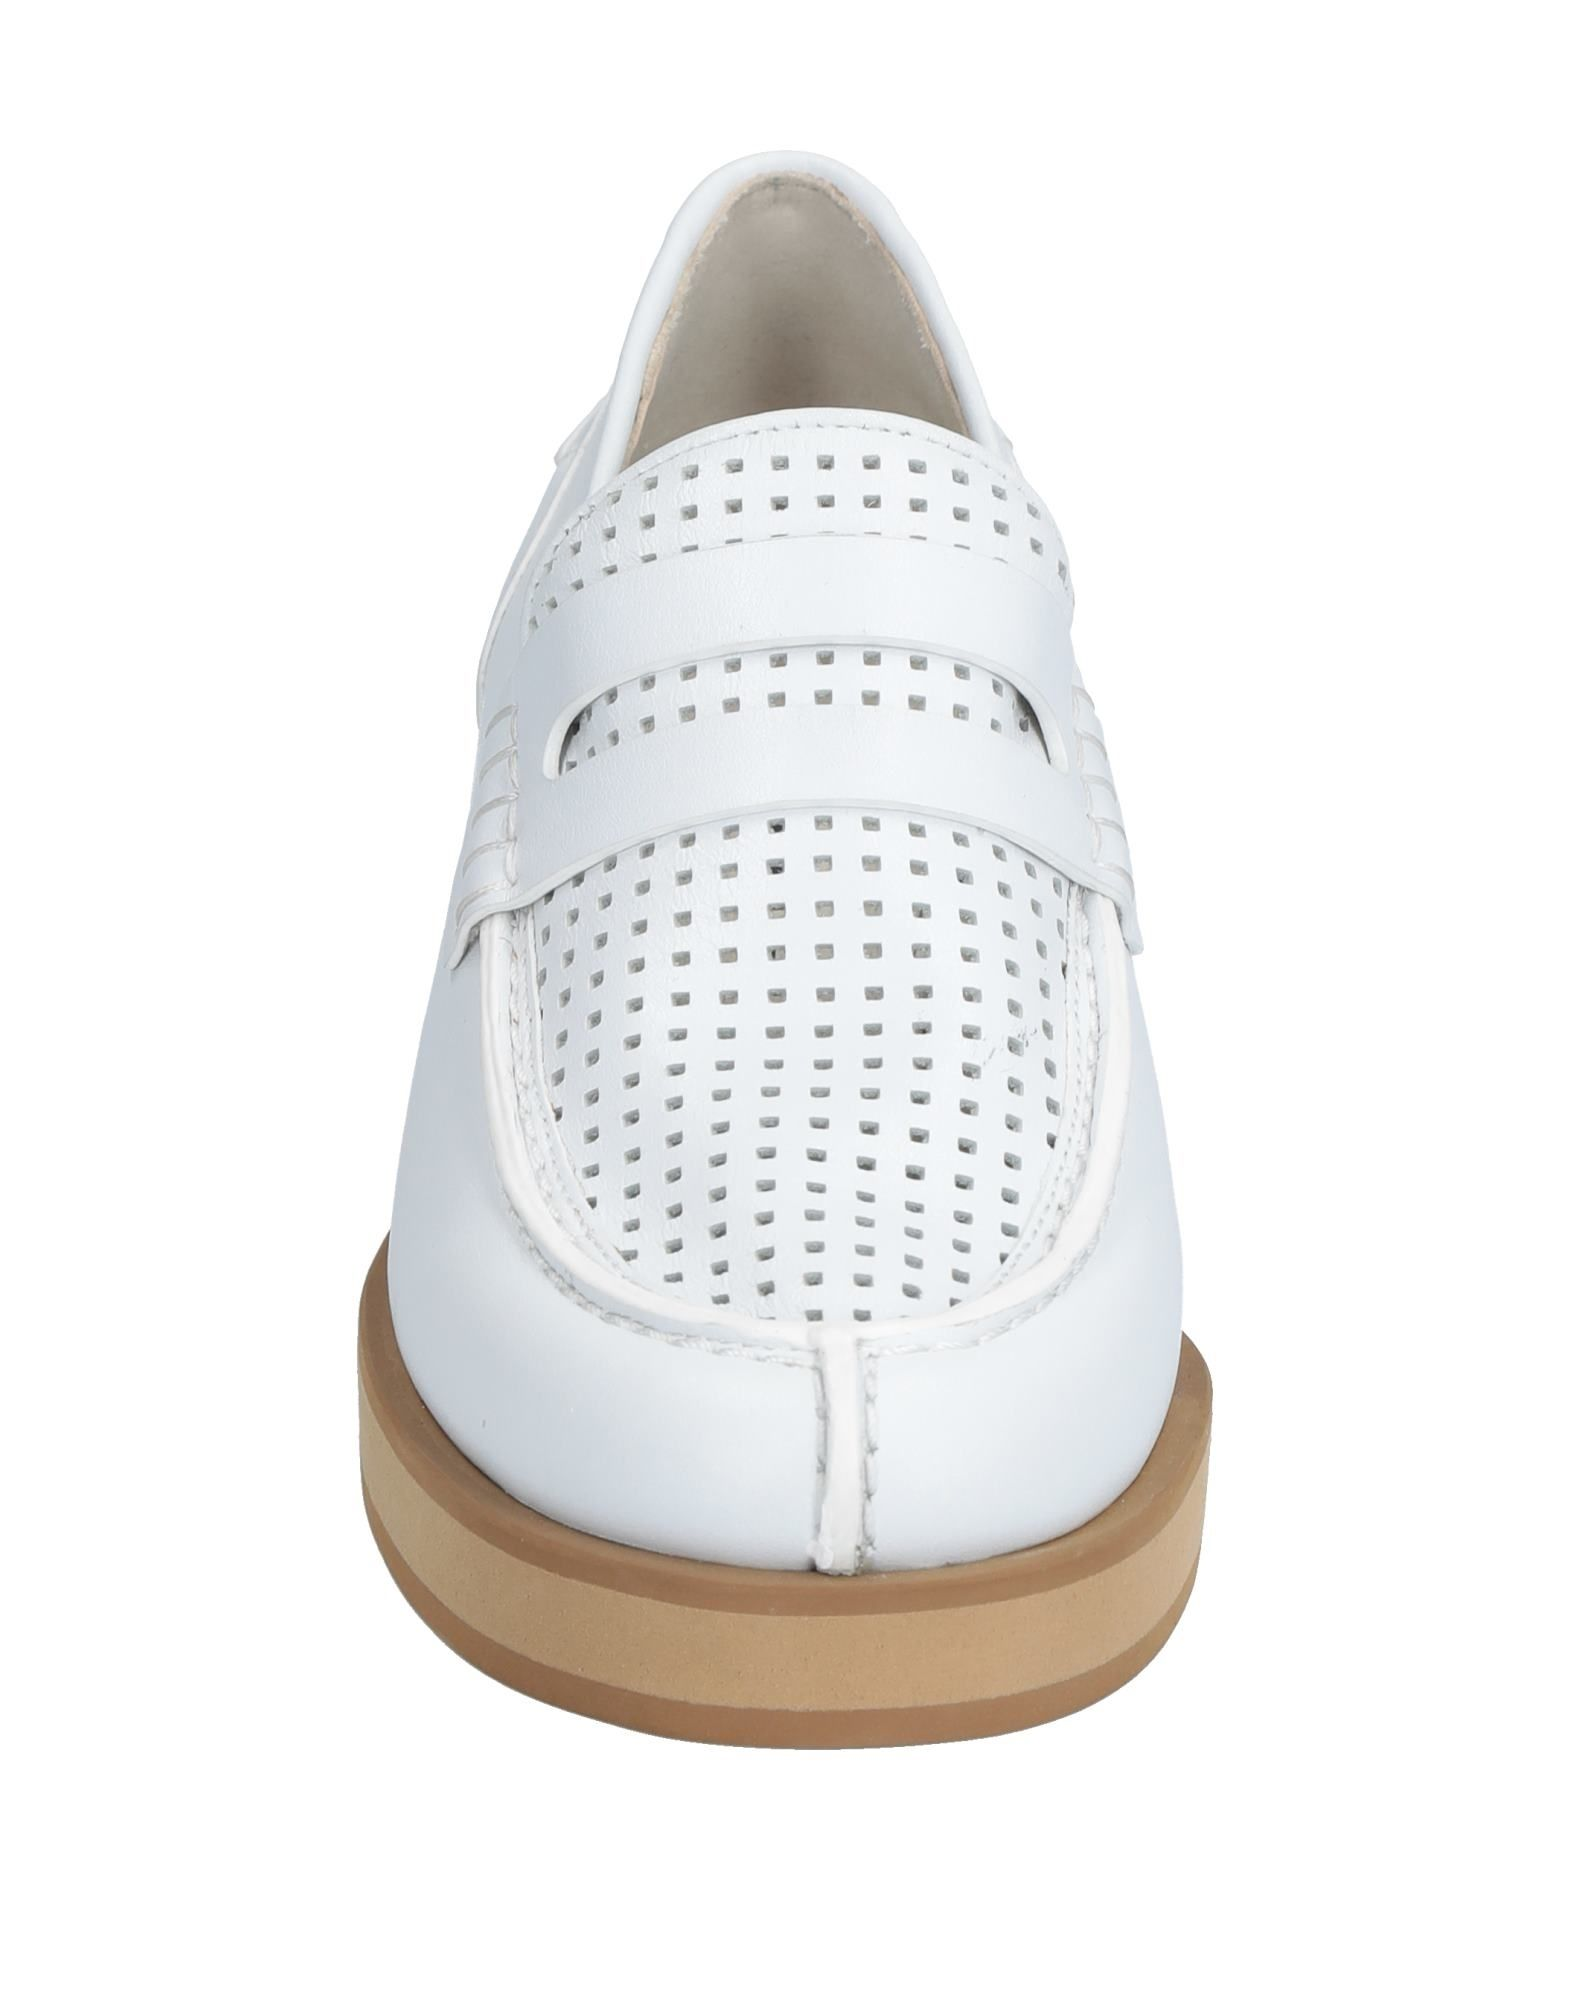 Jil Sander Navy Loafers - Loafers Women Jil Sander Navy Loafers - online on  Canada - 11542099CV 4c3327